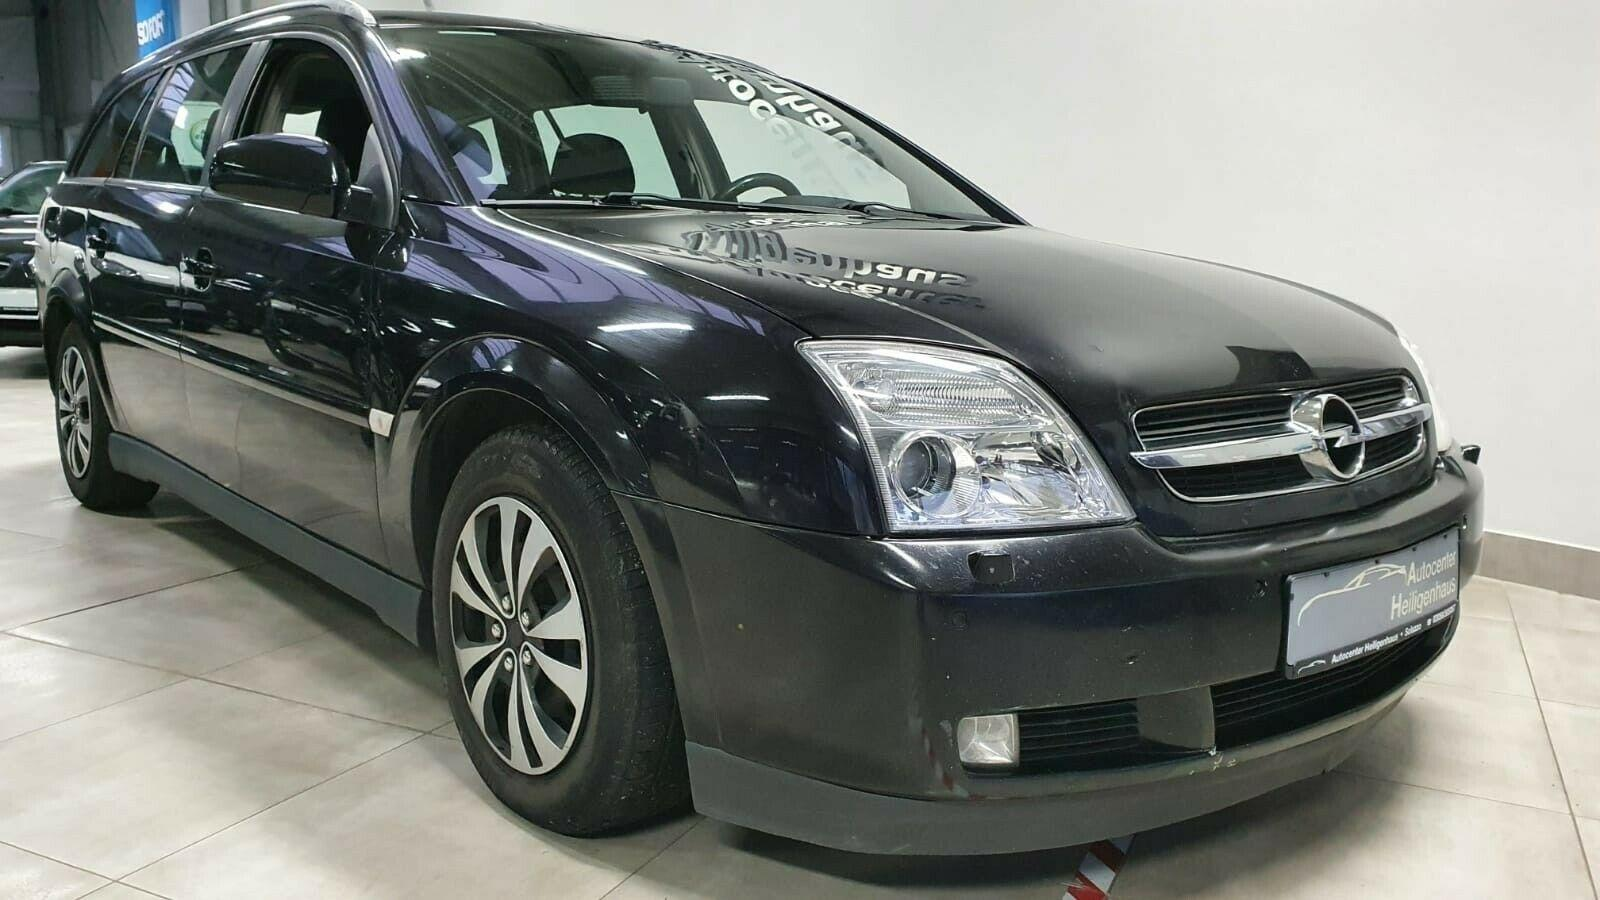 OPEL Vectra Caravan 1.9 CDTI Elegance Klima Tempo PDC